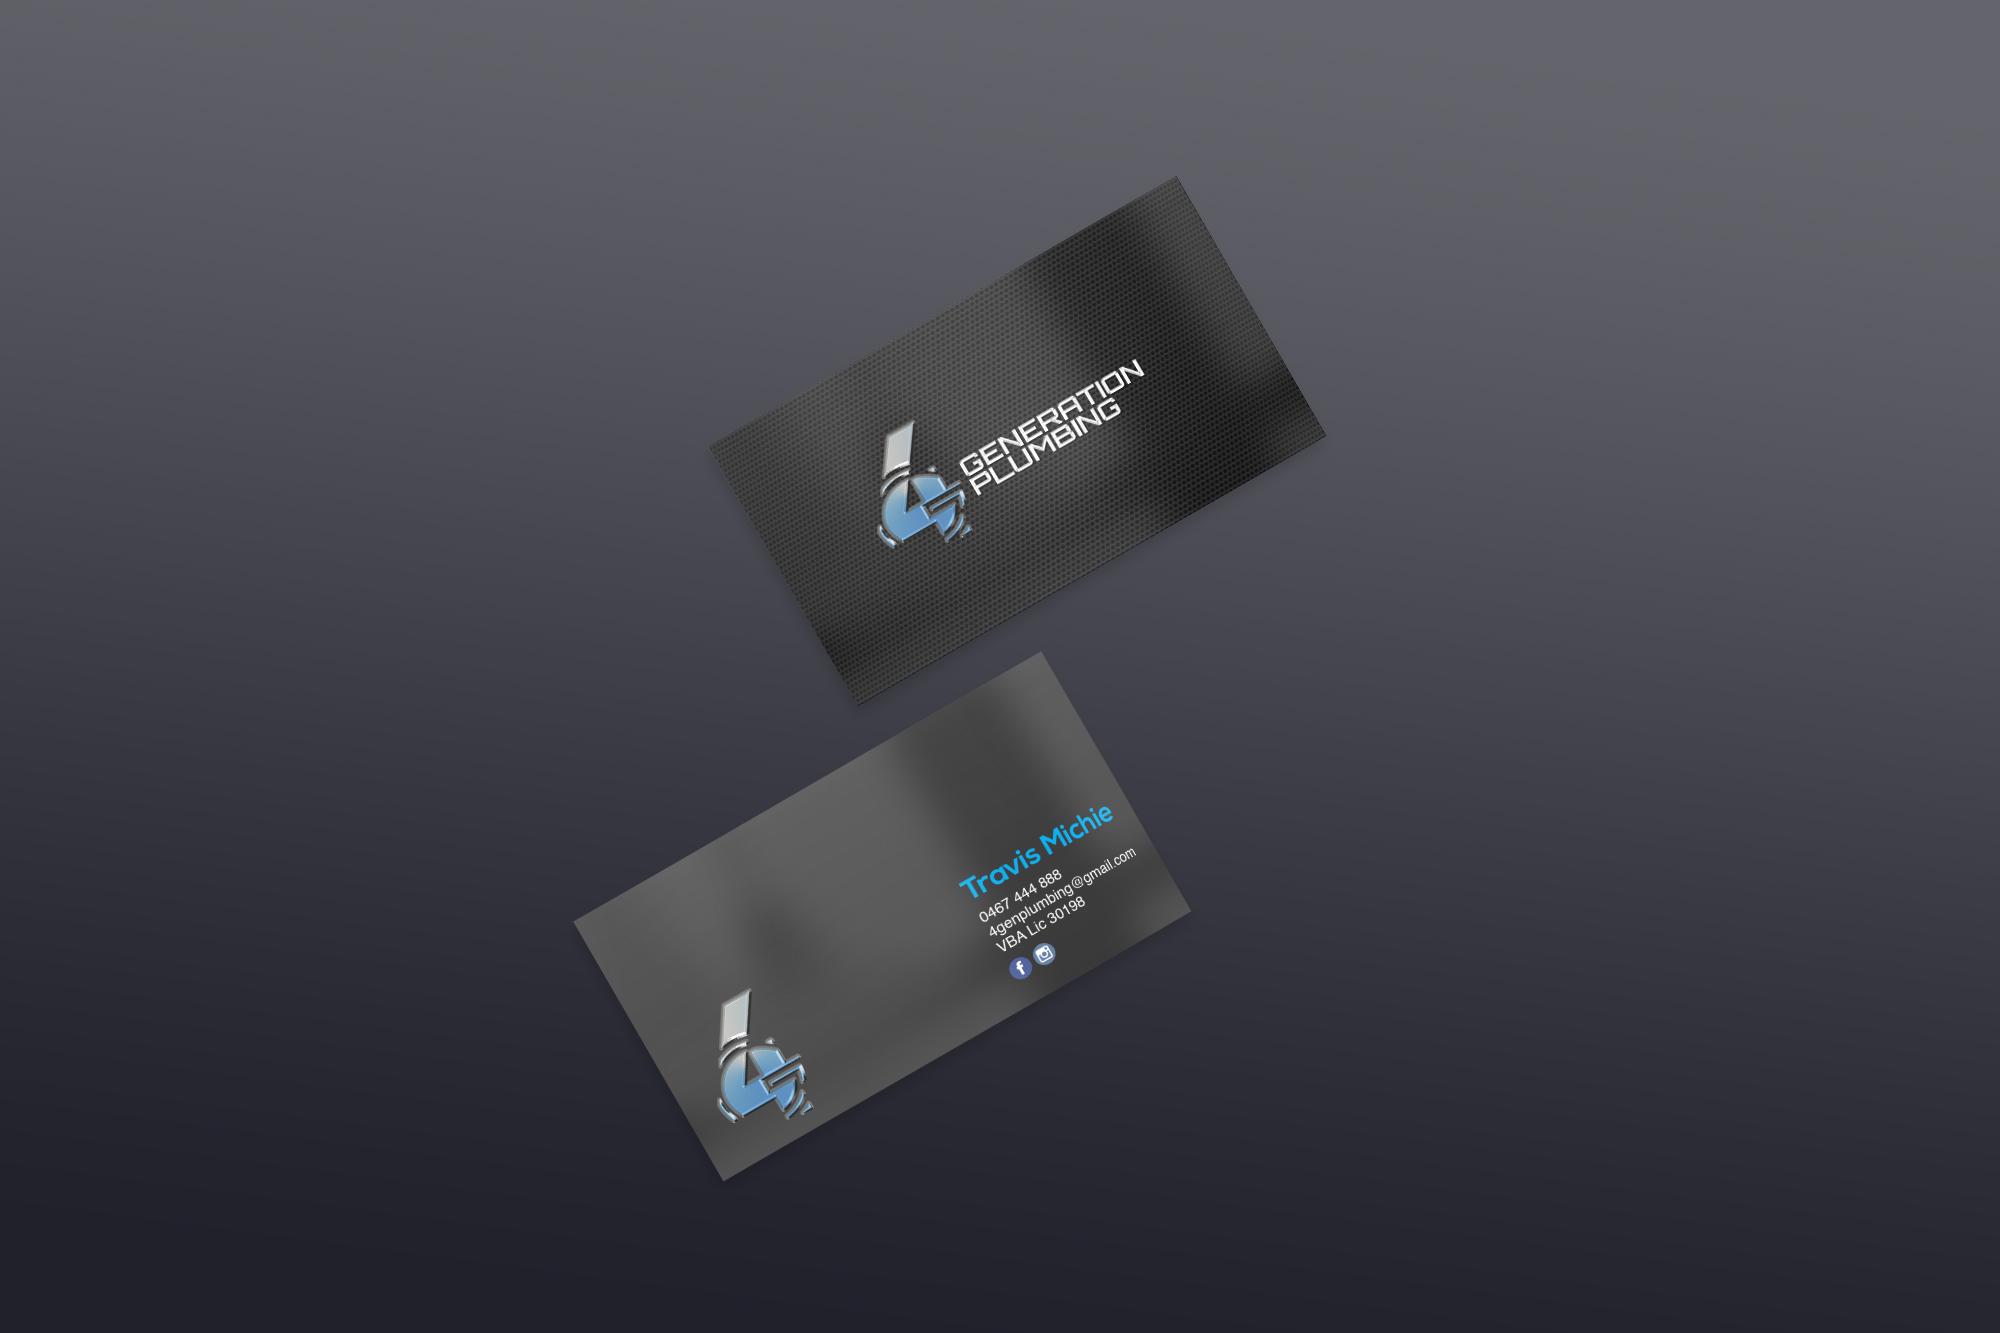 Business card design, Shop now!